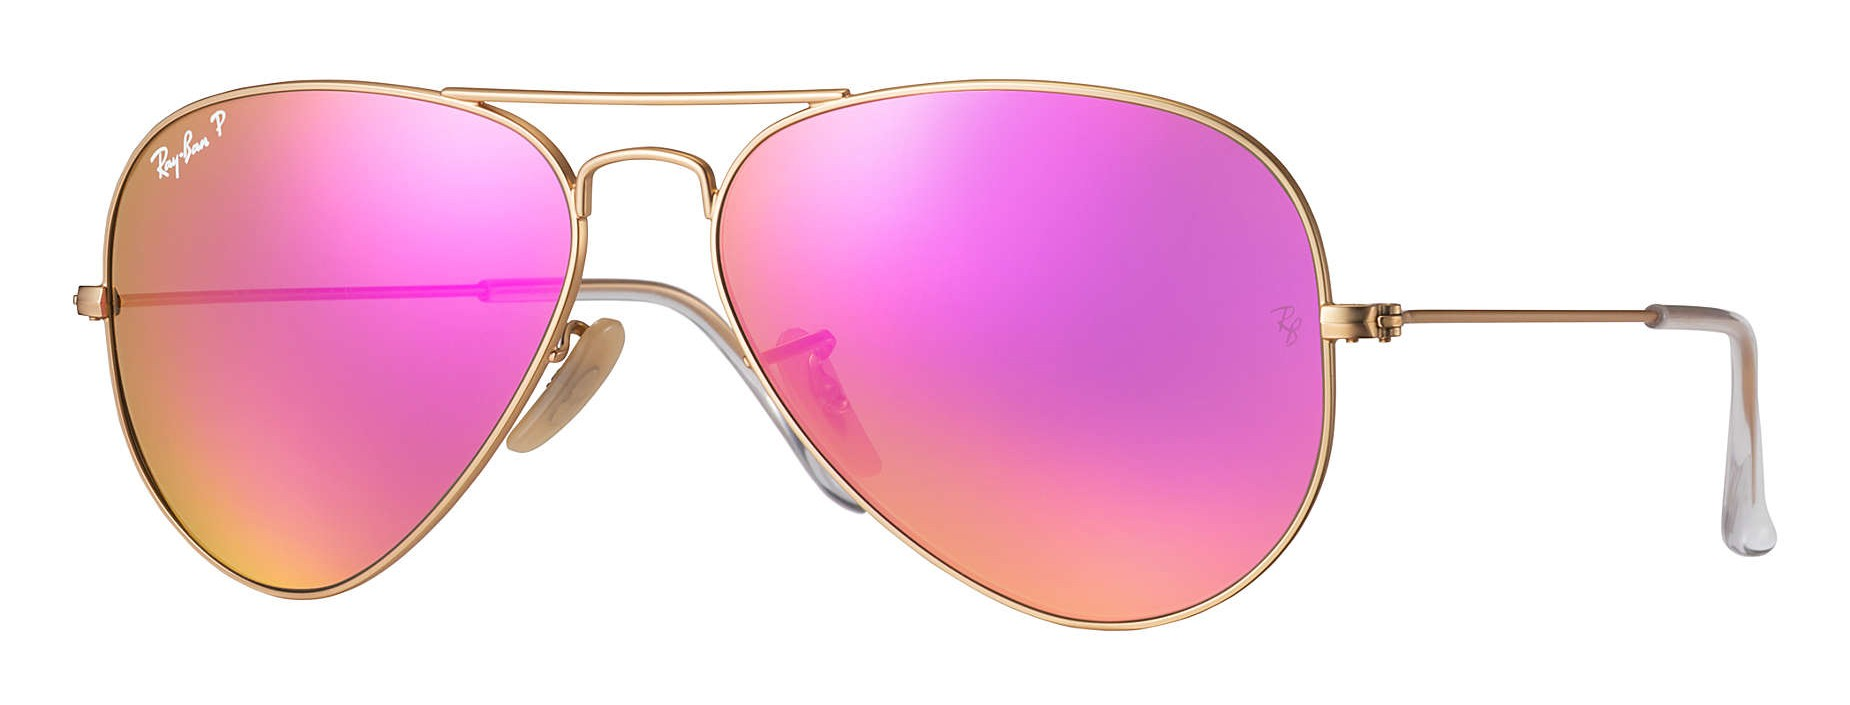 8280f0f0bd12 Ray-Ban - RB3025 112 1Q - Original Aviator Flash Lenses - Gold - Polarized Cyclamen  Flash Lenses - Sunglass - Ray-Ban Eyewear - Avvenice